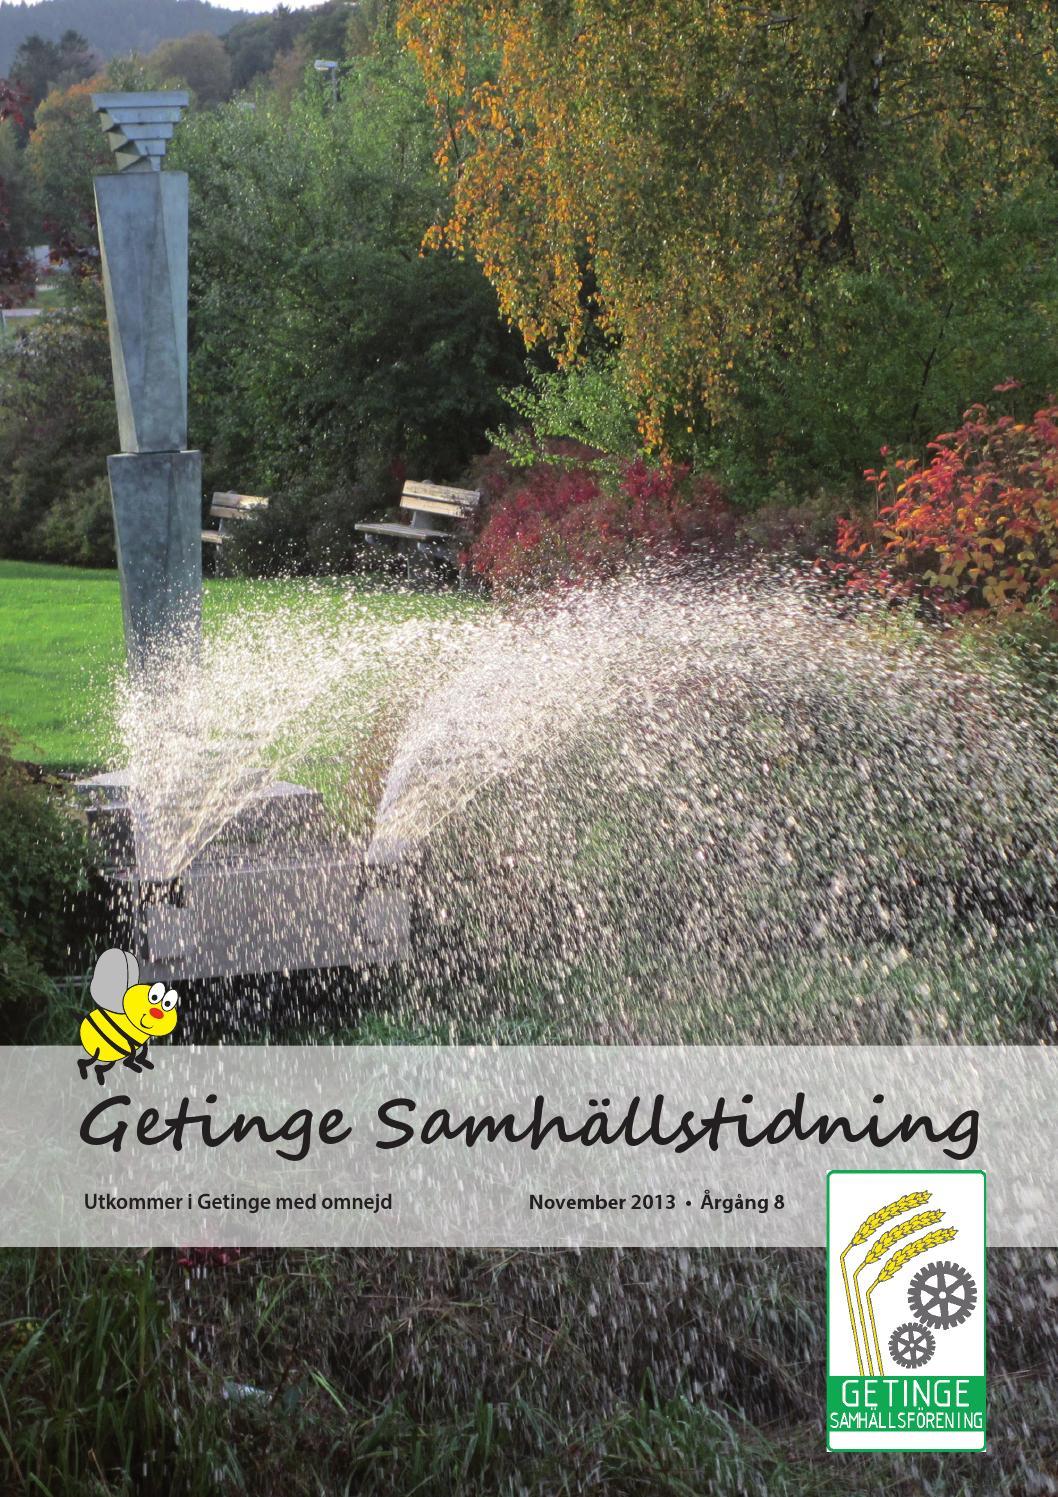 Gsft 2016 11 low by Getinge Samhllsfrening - issuu